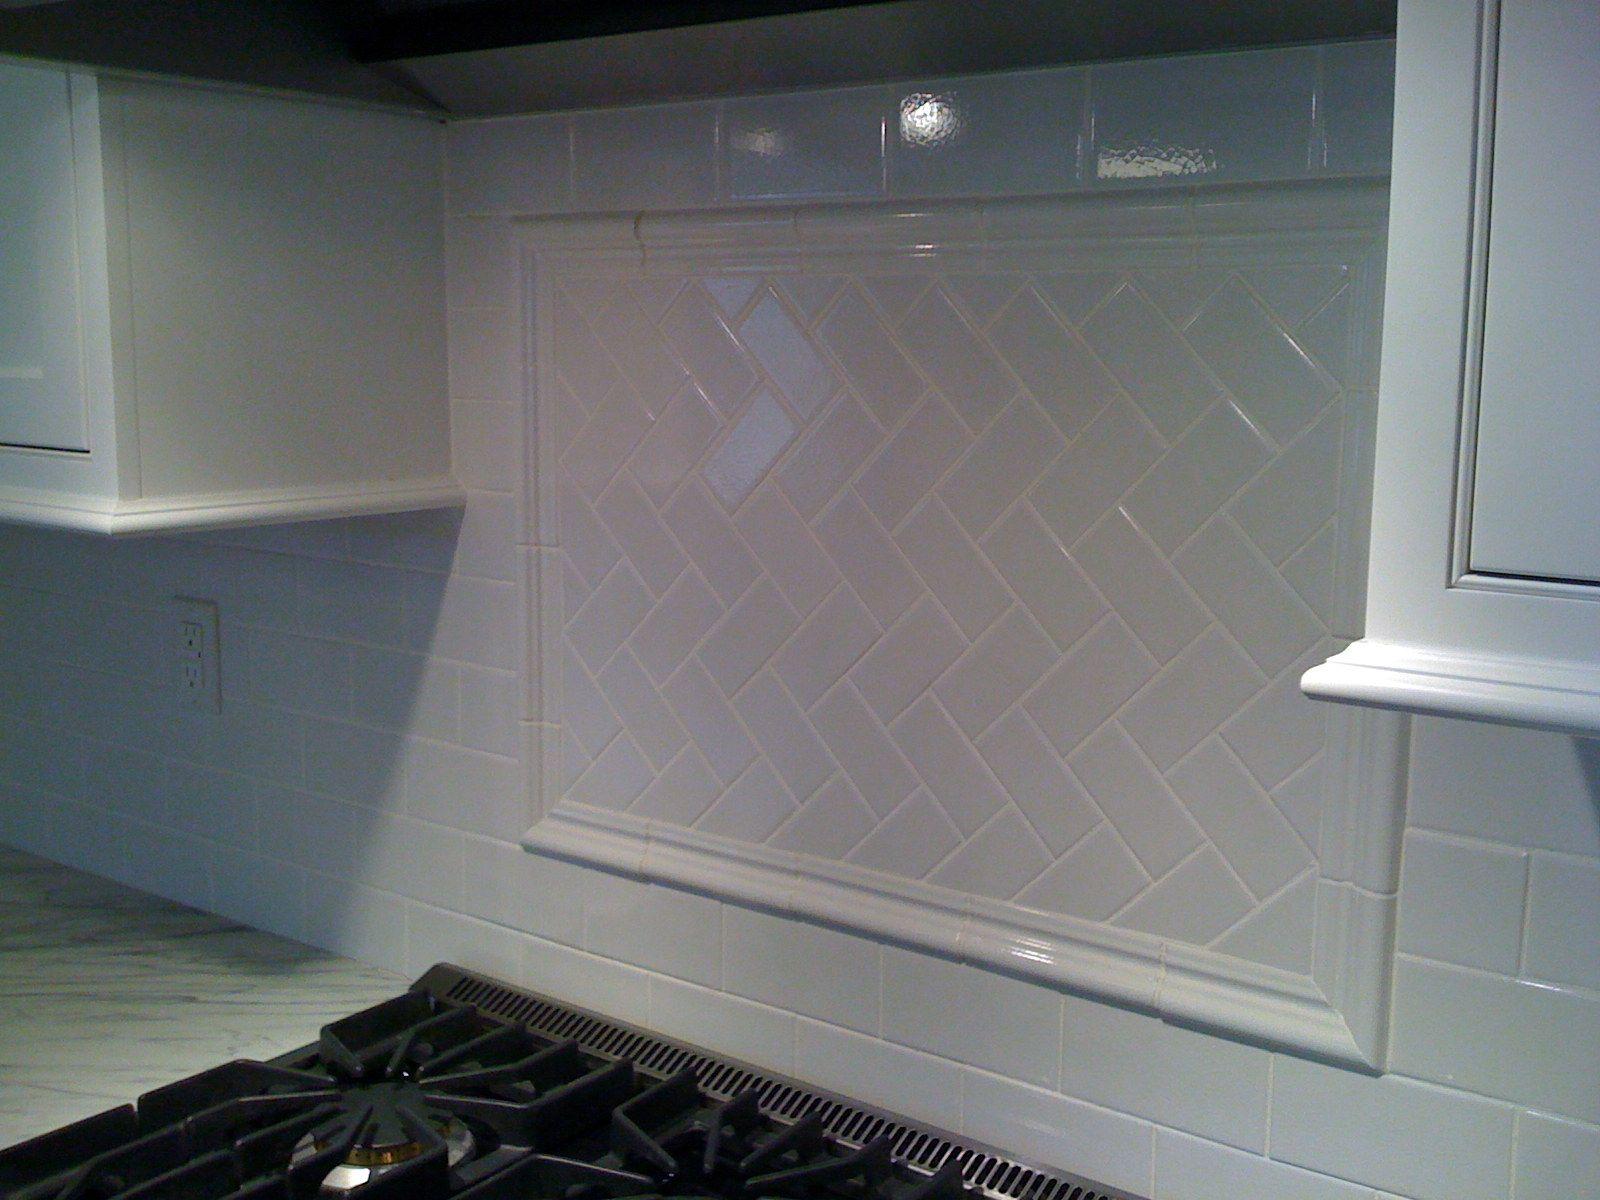 White Subway Tile With Herringbone Backsplash Behind Stove